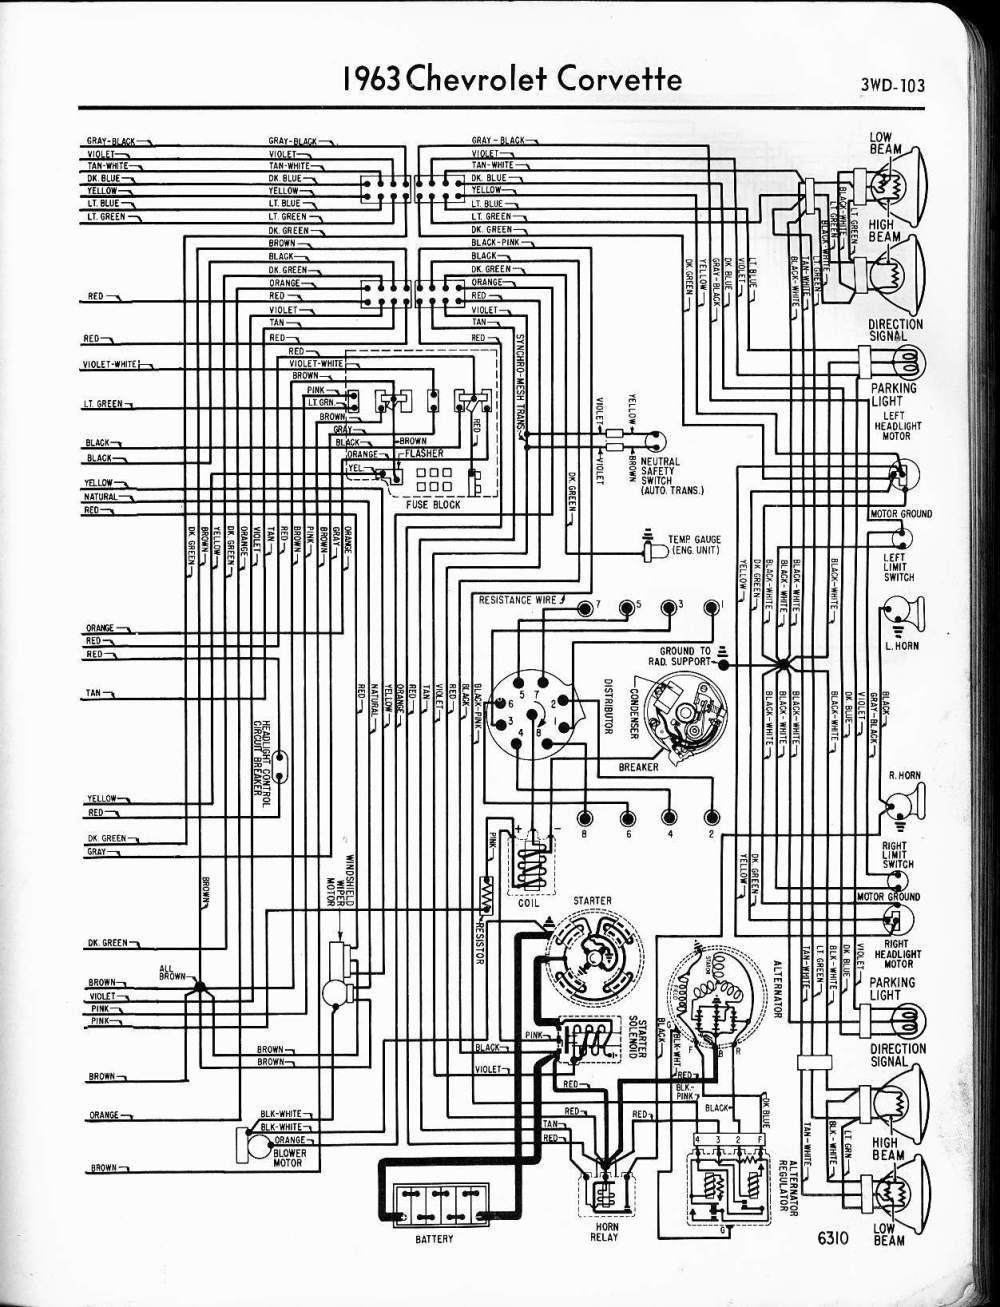 medium resolution of 94 chevy corvette wiring diagram circuit diagram wiring diagram 1985 chevy corvette wiring diagram premium